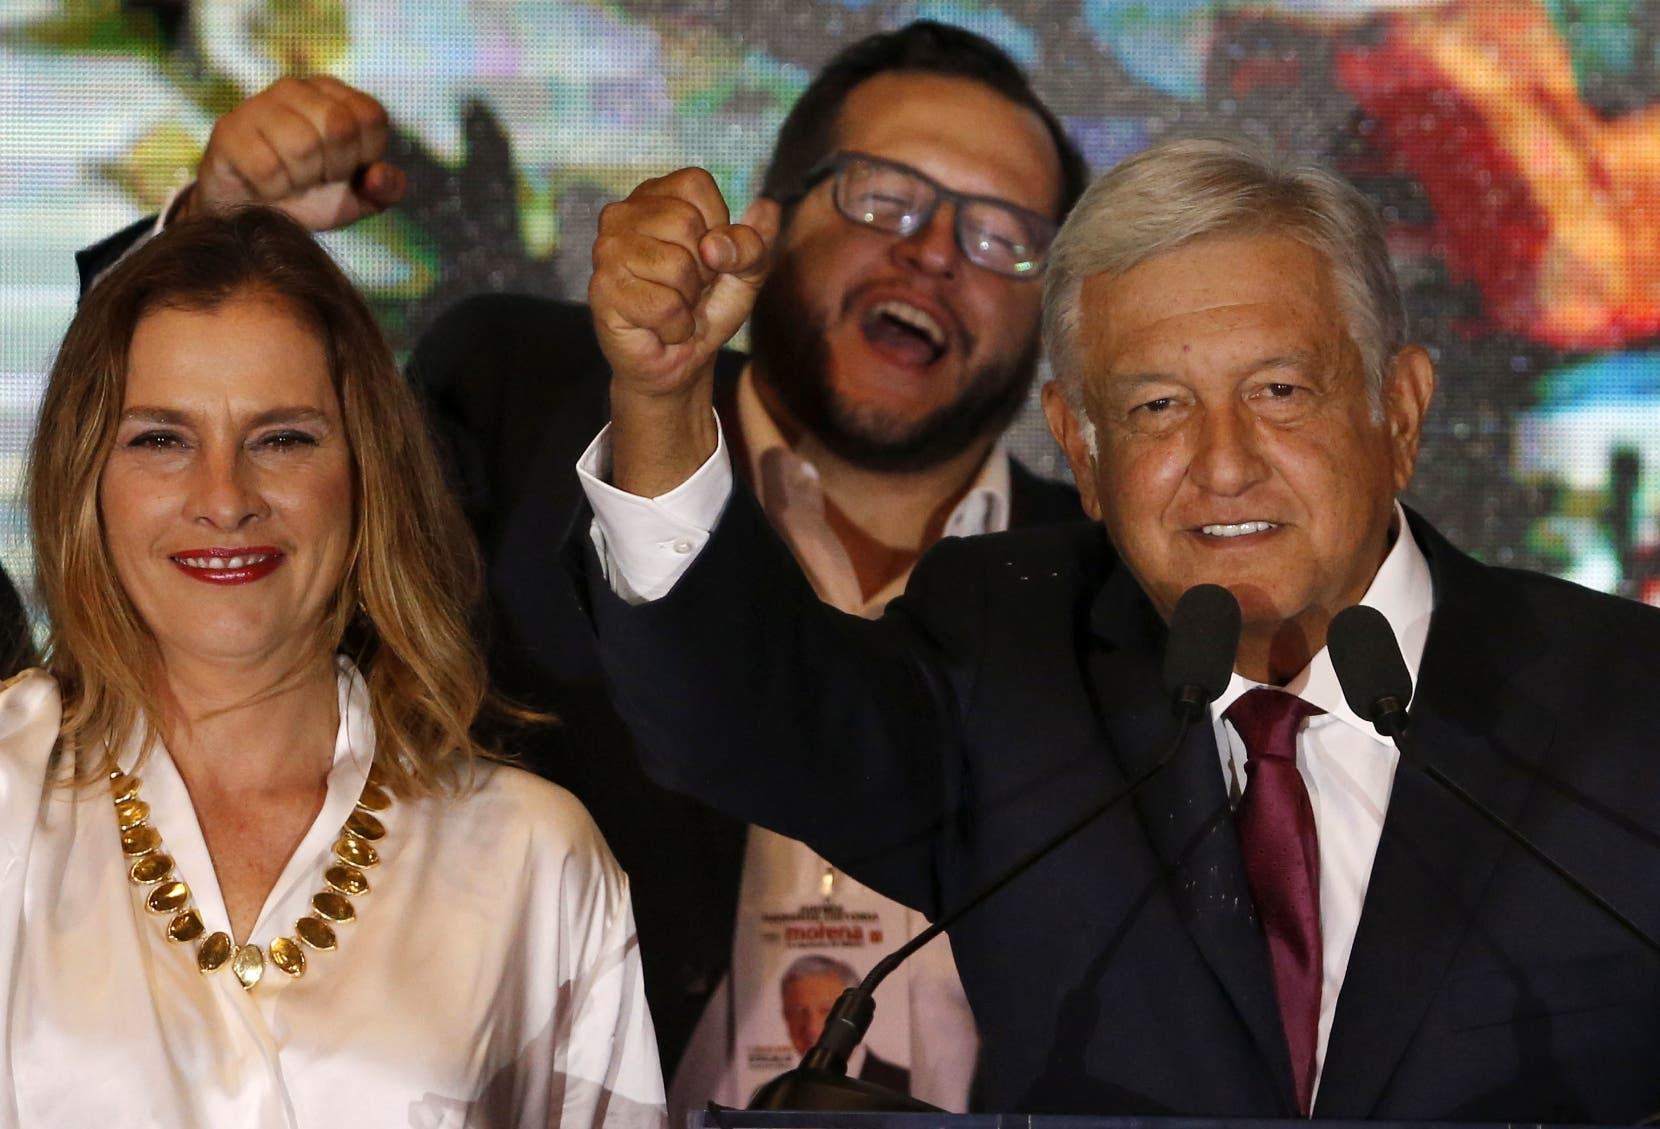 El presidente electo Andrés López Obrador prometió combatir la pobreza que afecta a cerca de 50 millones de personas.